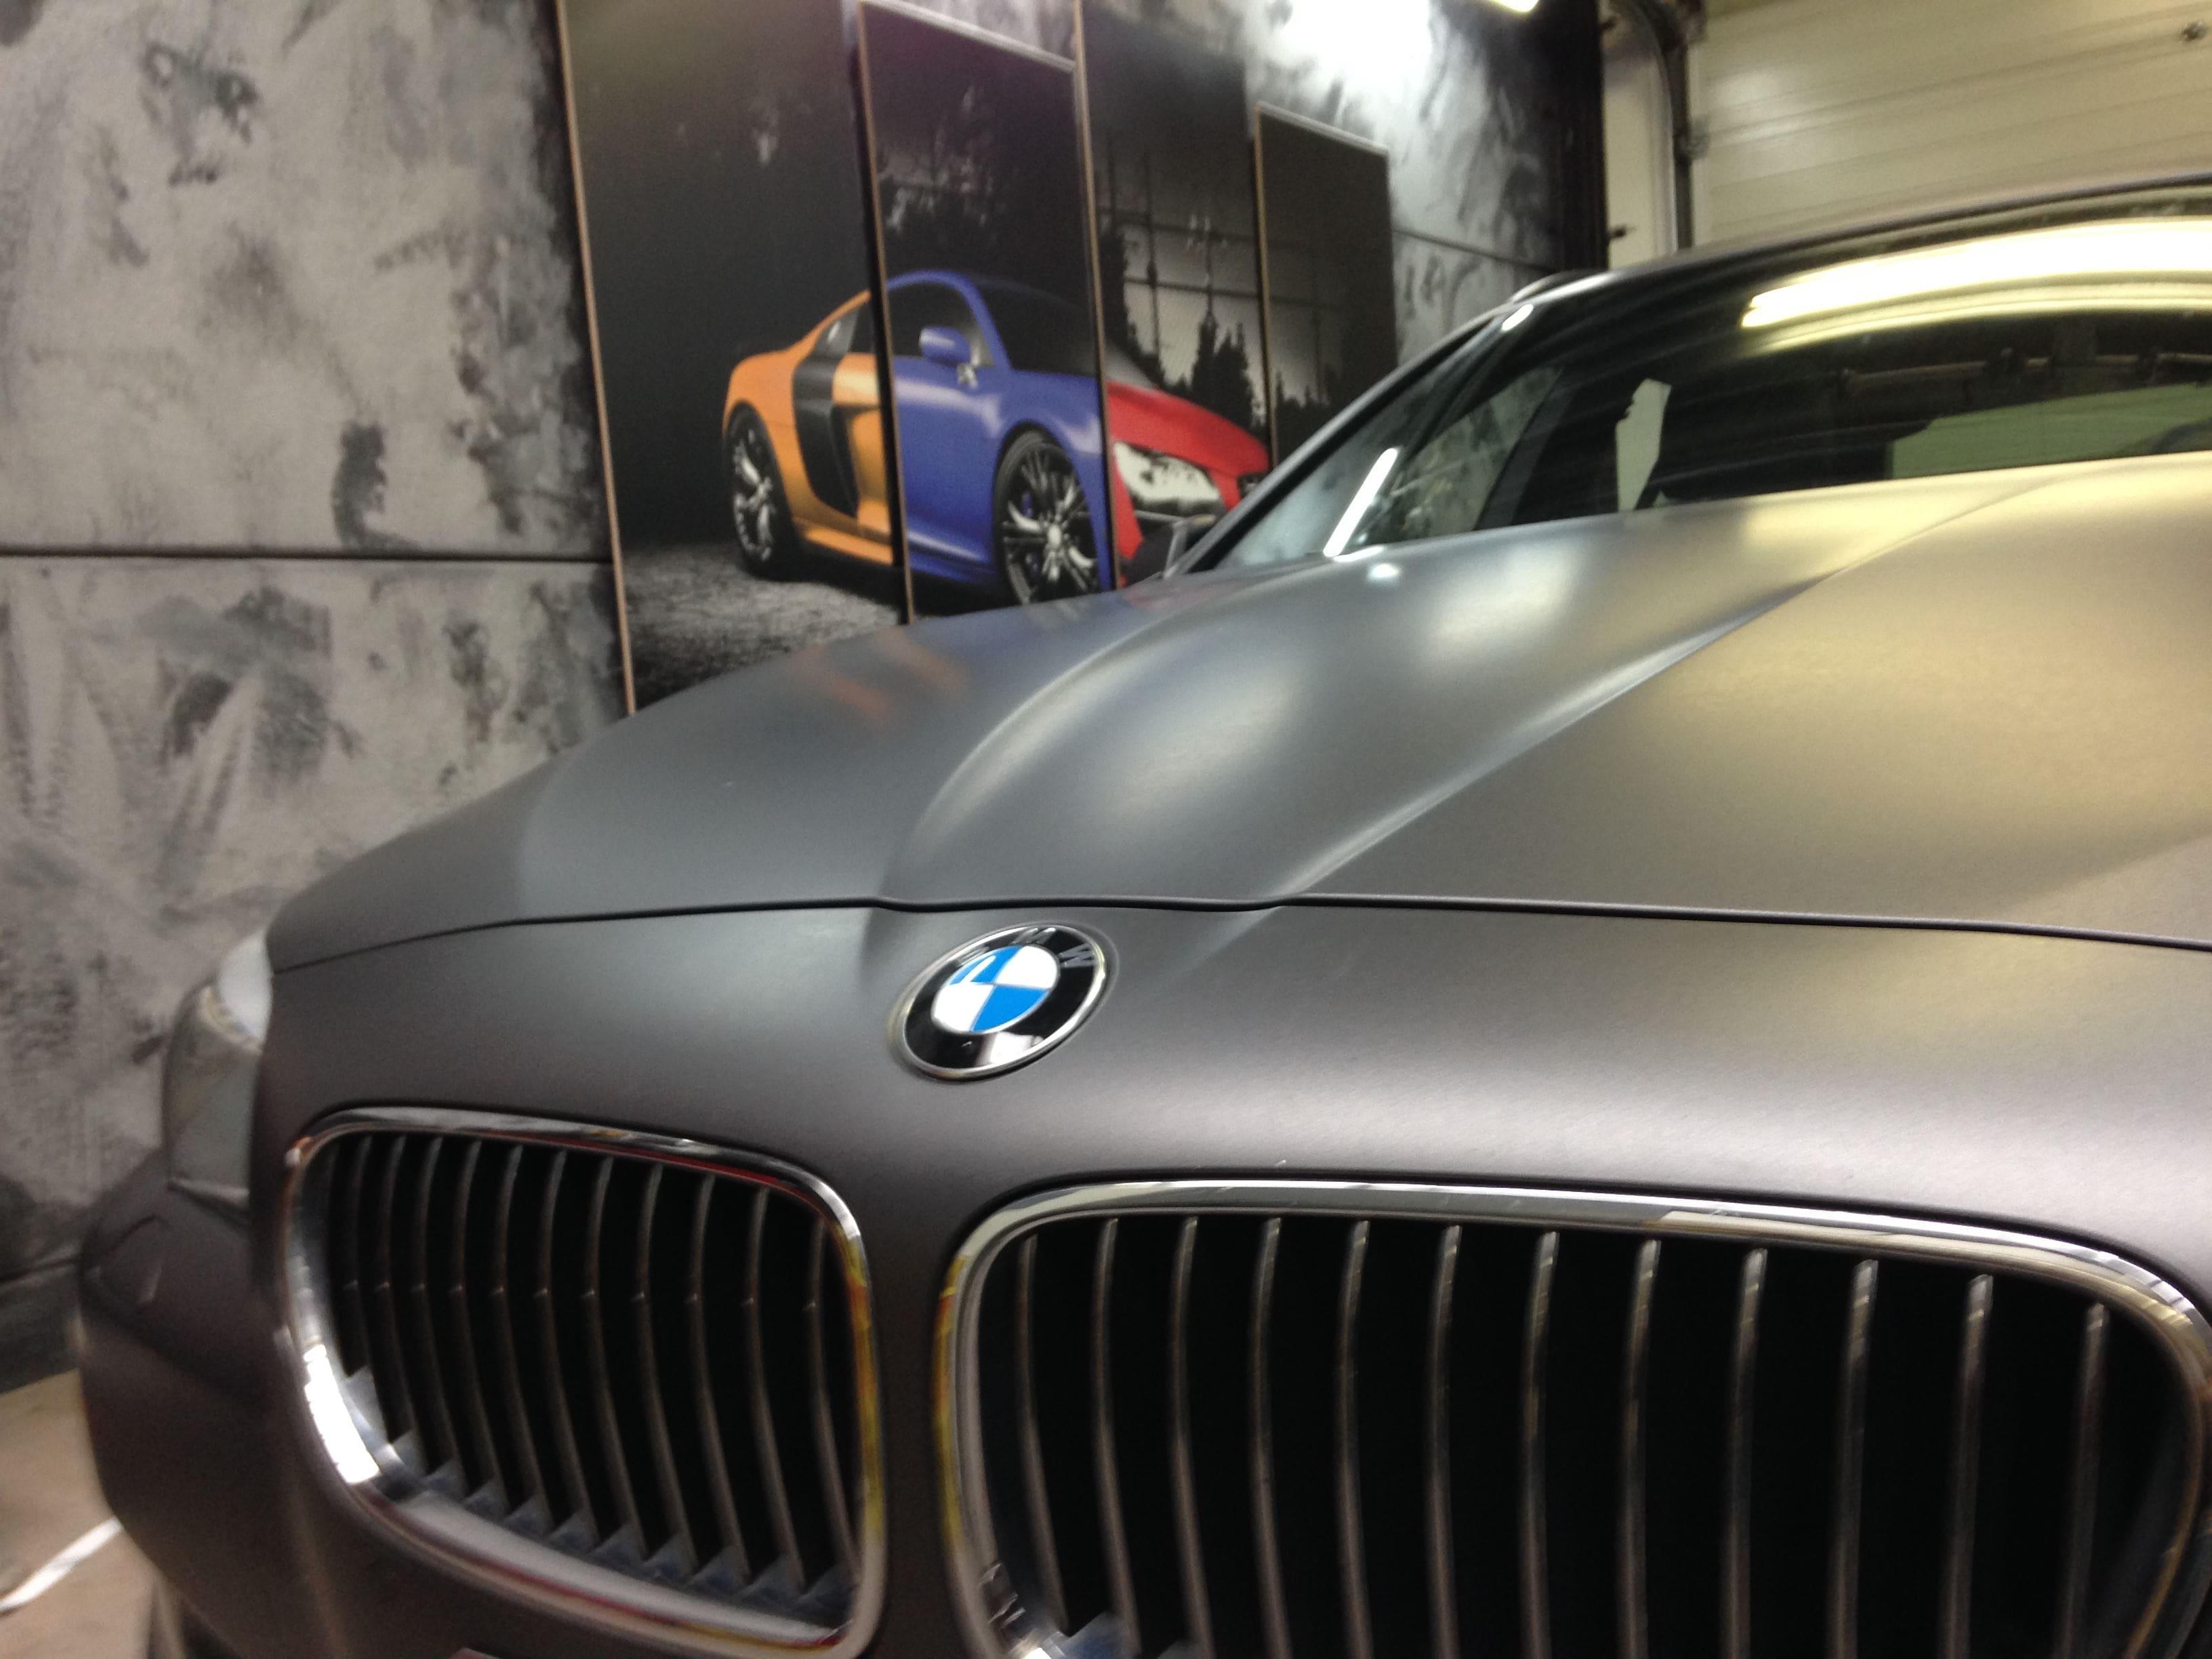 BMW 5 Serie met Gunpowder Wrap, Carwrapping door Wrapmyride.nu Foto-nr:5268, ©2021